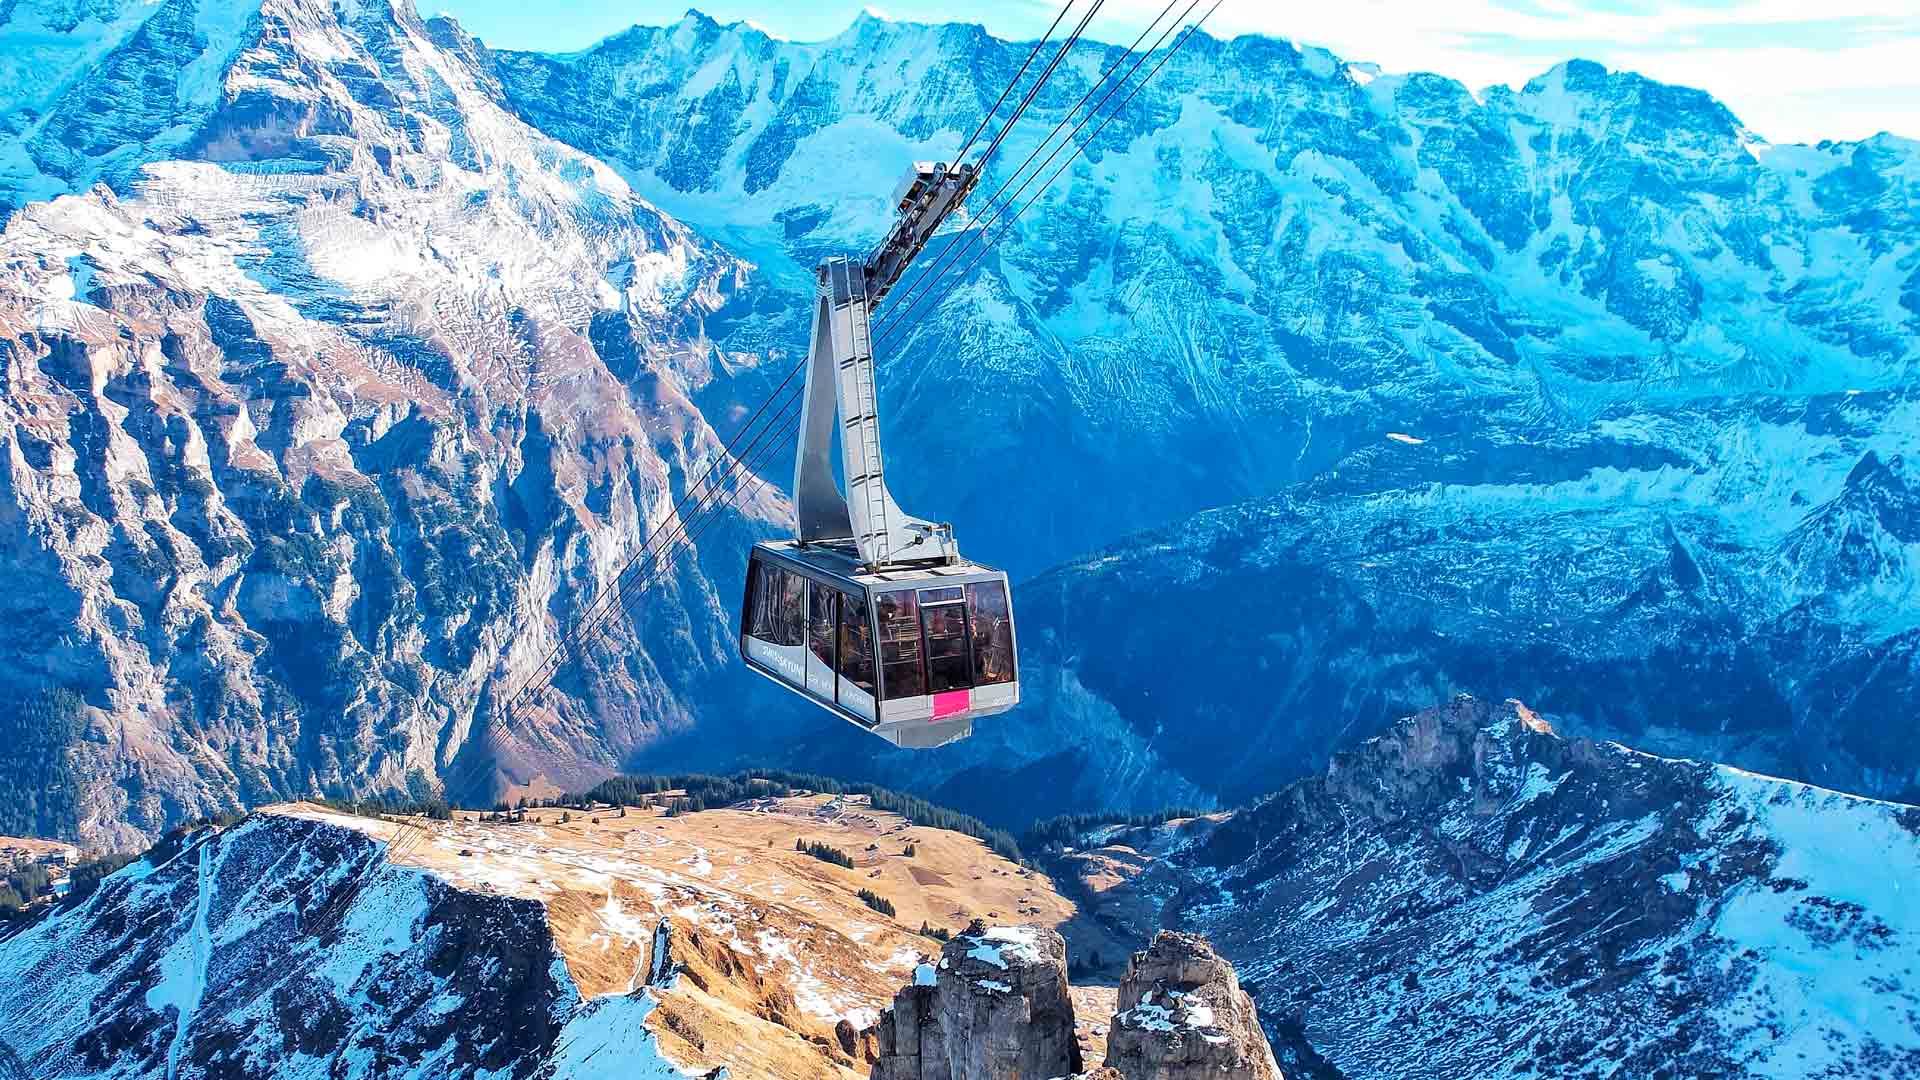 Vista dos Alpes Suíços